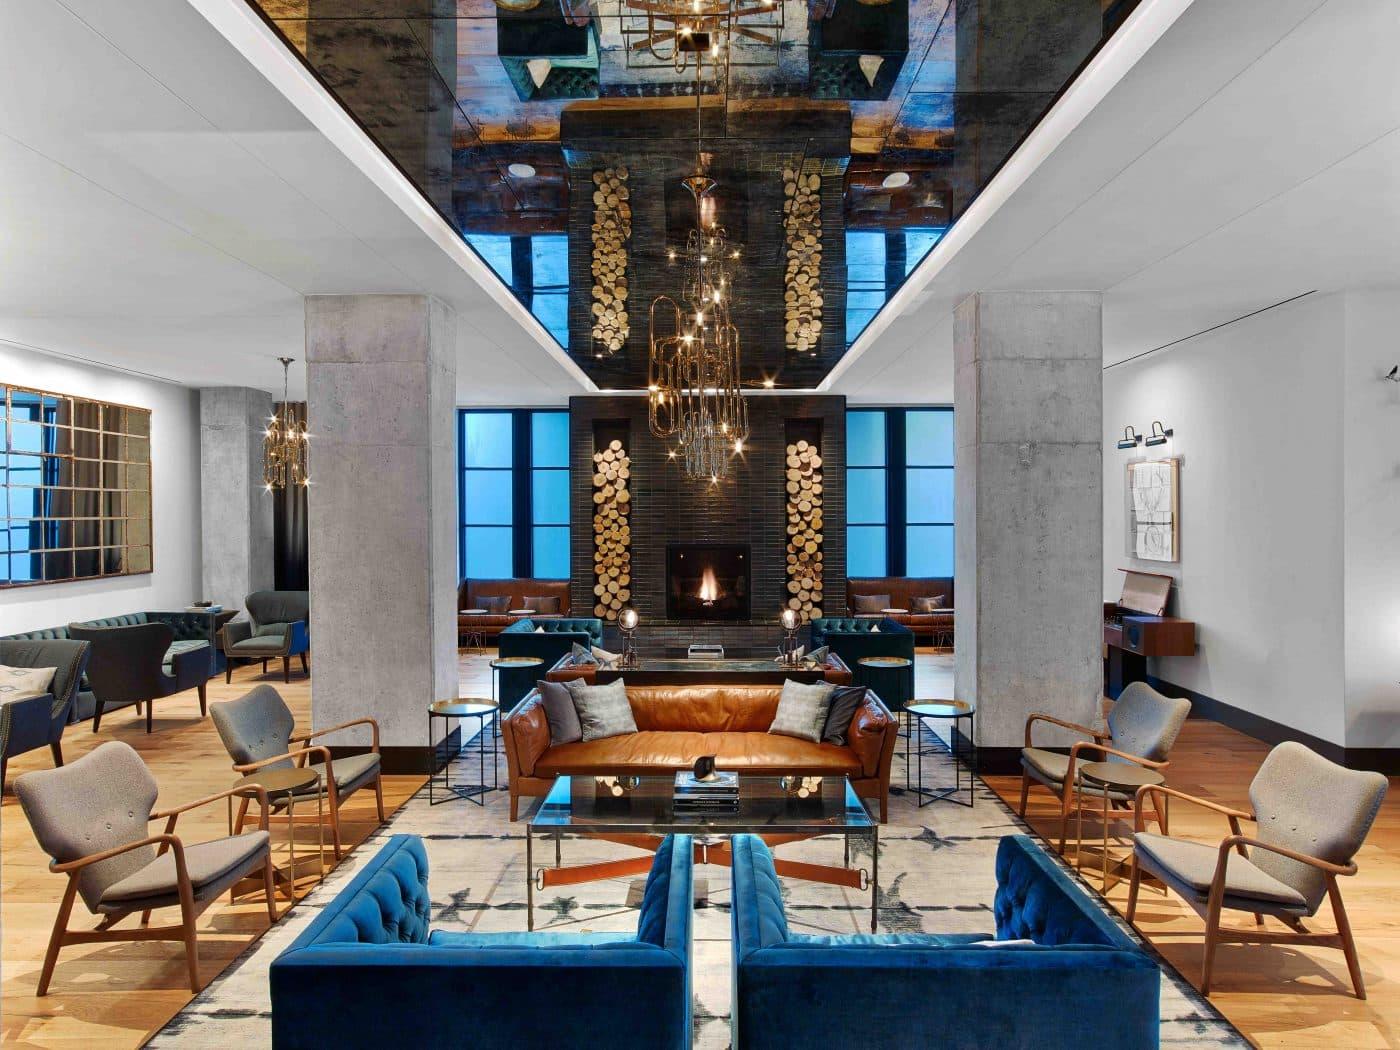 Kimpton Van Dandt Hotel lobby in Austin designed by Mark Zeff